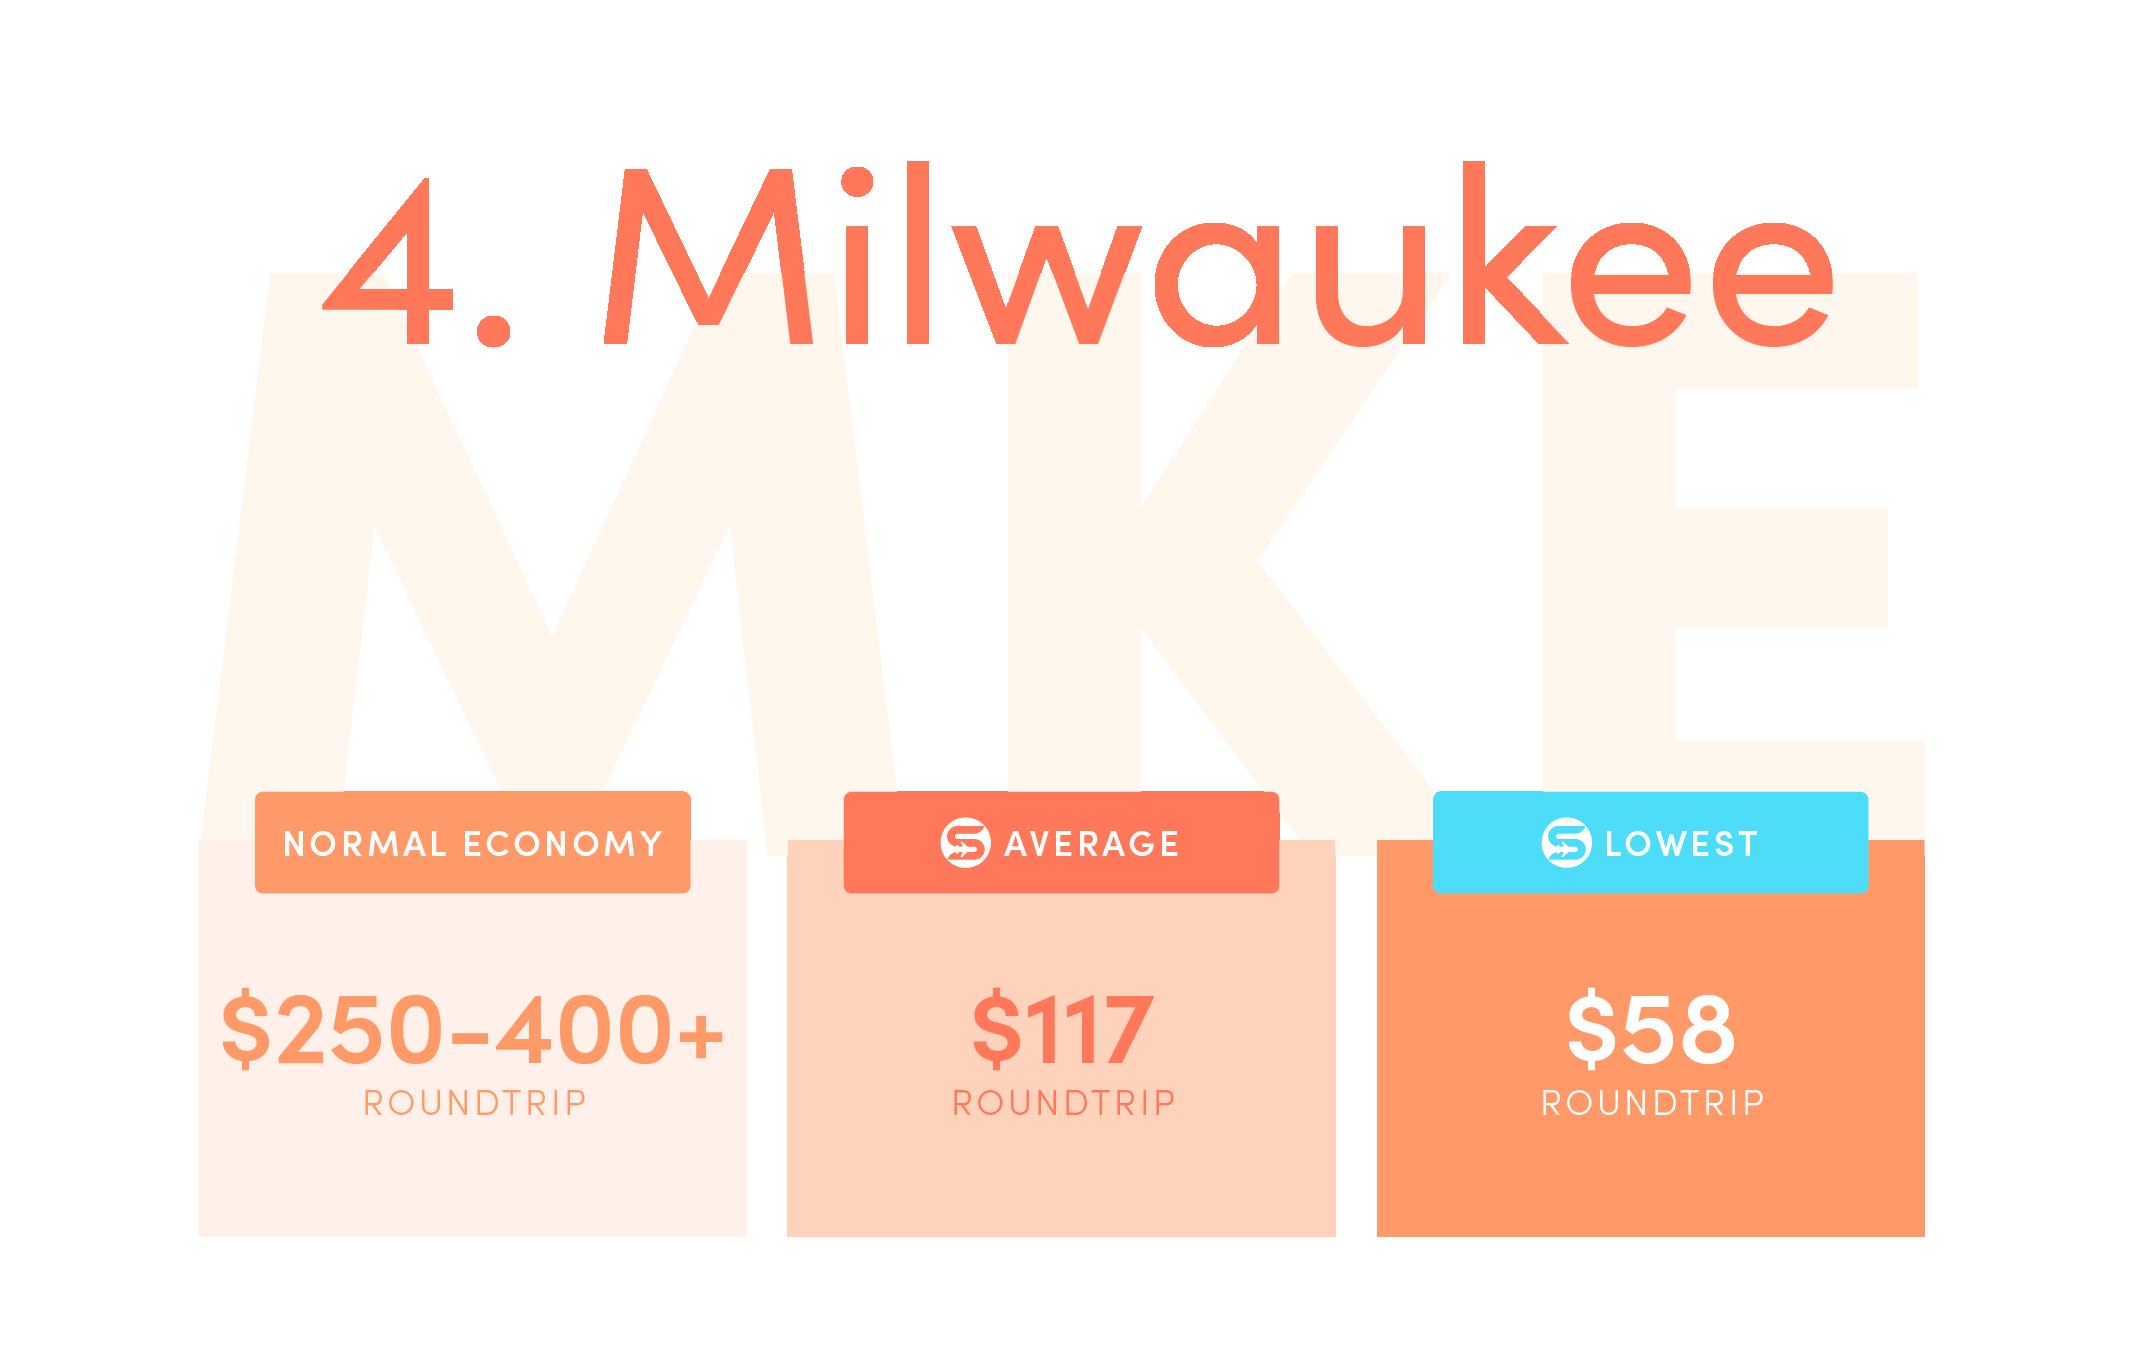 Milwaukee (MKE).Normal economy price from the US: $250-$400+ roundtrip.Average Scott's Cheap Flights economy price: $117 roundtrip.Lowest Scott's Cheap Flights price in 2021: $58 roundtrip.